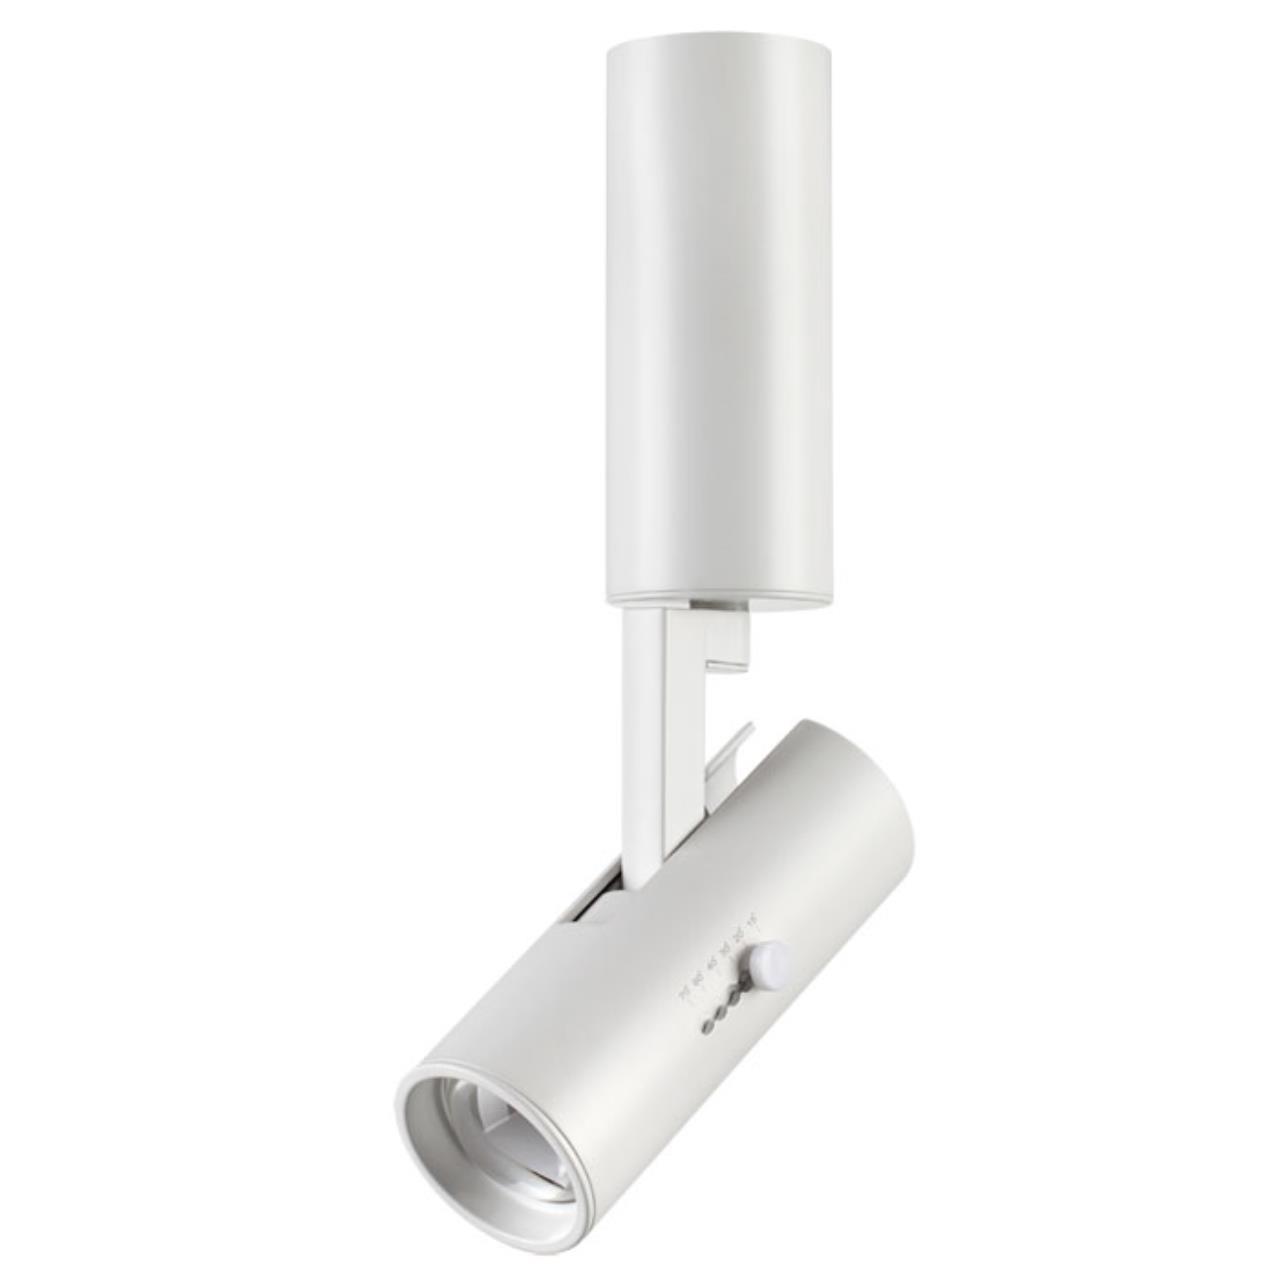 357544 OVER NT18 061 белый Накладной светильник IP20 LED 3000K 15W 220-240V BLADE